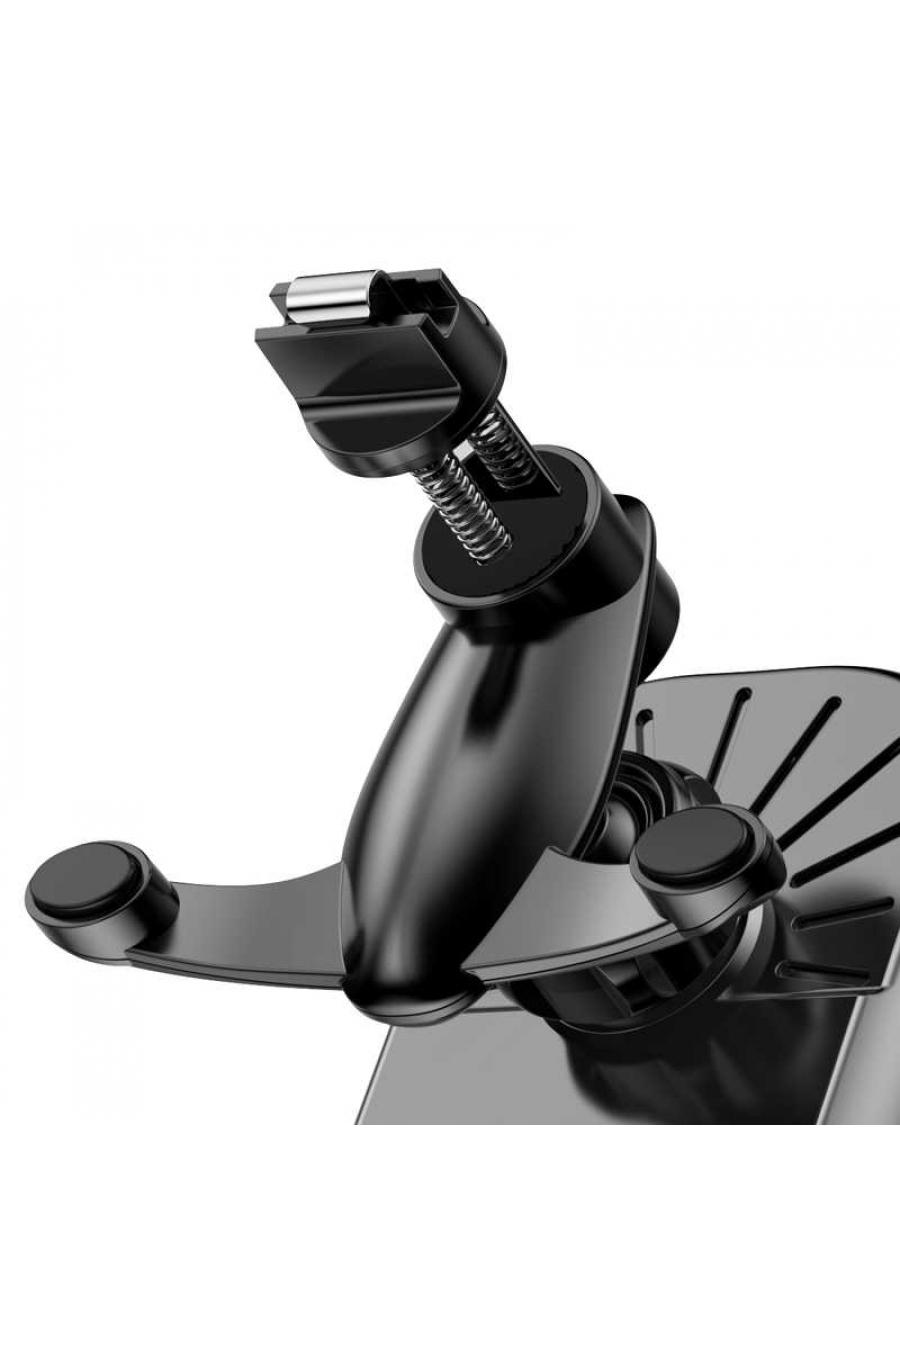 Baseus Smart Vehicle Araç Telefon Tutucu Kablosuz Şarj Aleti WXZN-01